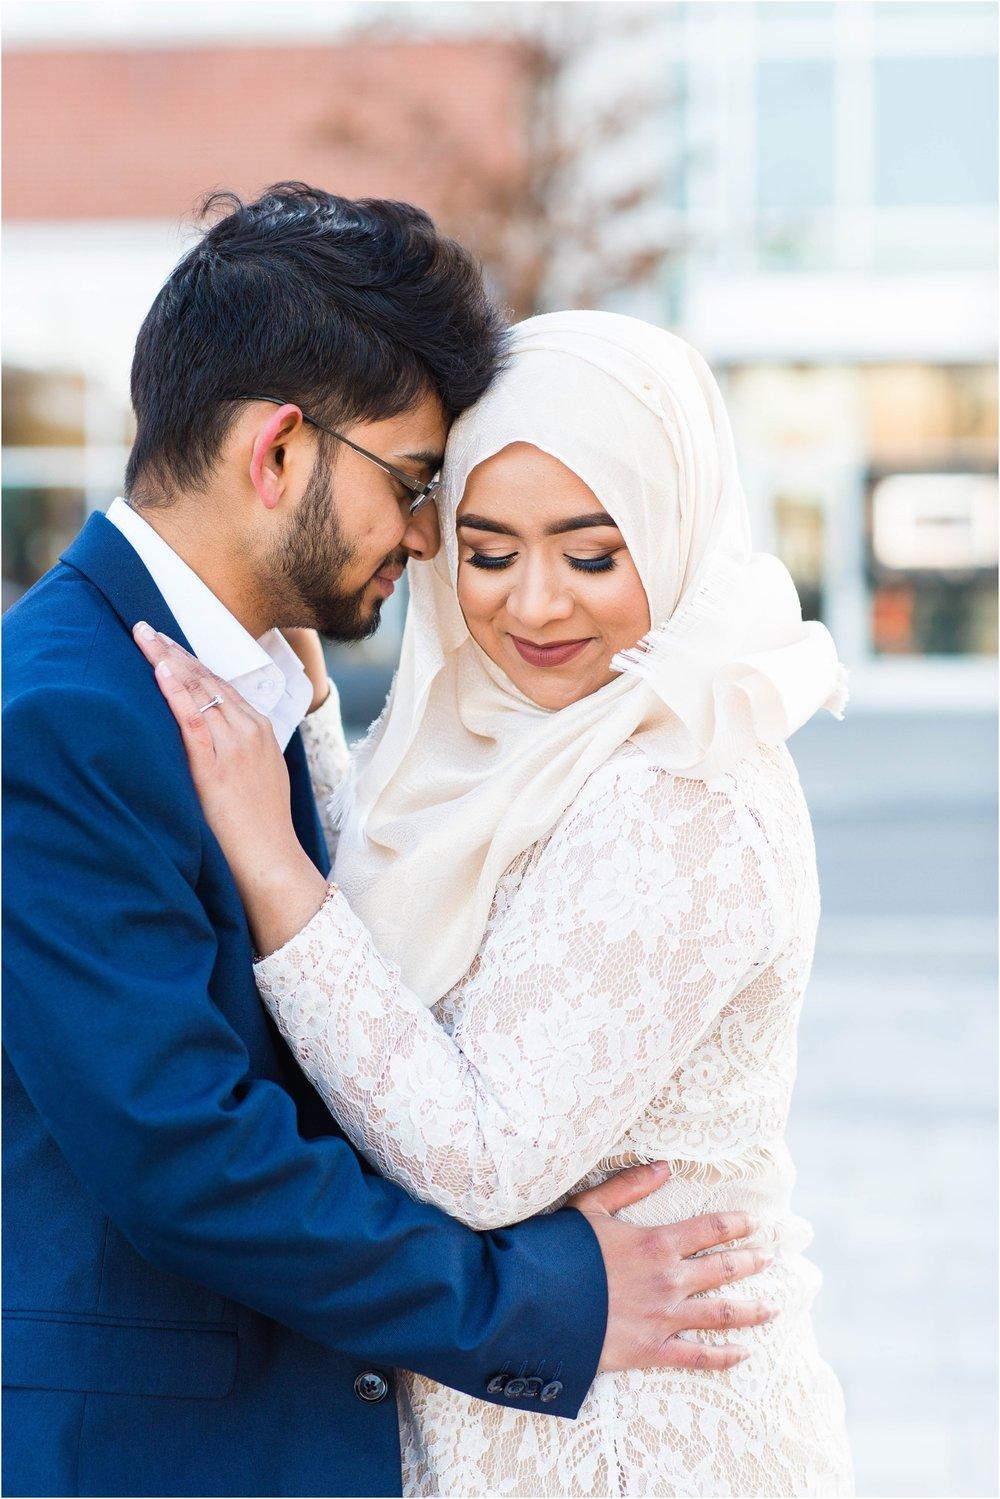 Shops-at-Don-Mills-Engagement-Session-Toronto-Mississauga-Brampton-Scarborough-GTA-Pakistani-Indian-Wedding-Engagement-Photographer-Photography_0014.jpg